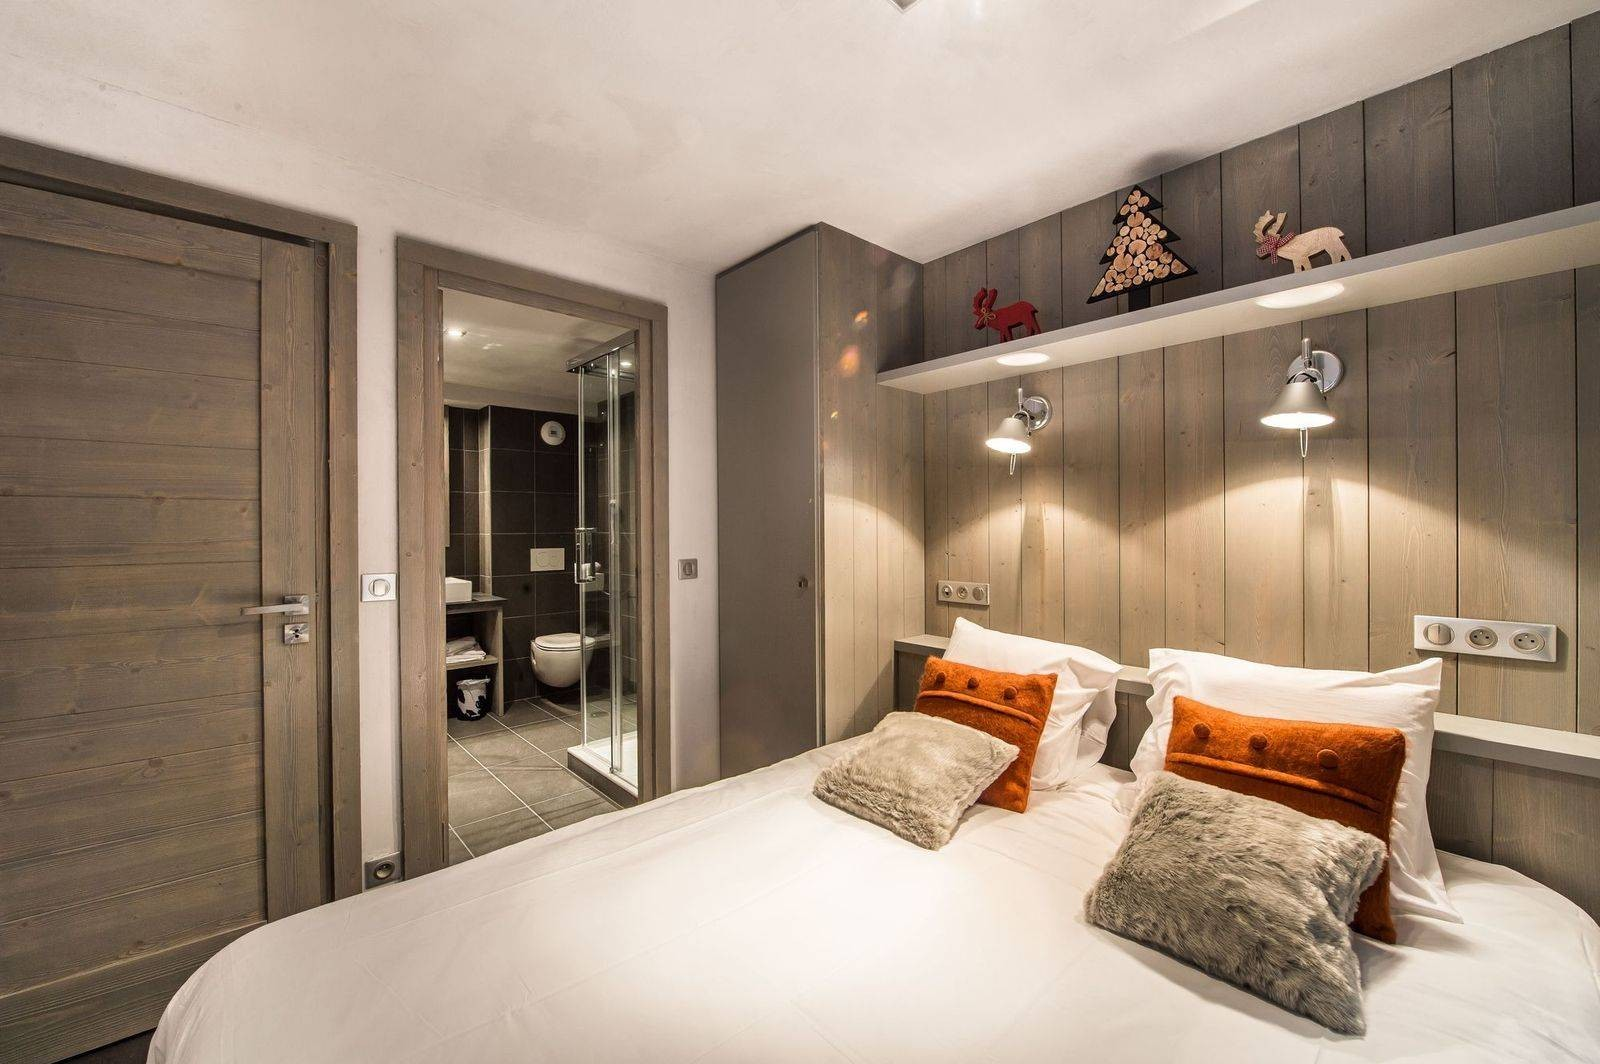 Courchevel 1650 Location Appartement Luxe Dalersi Chambre 2